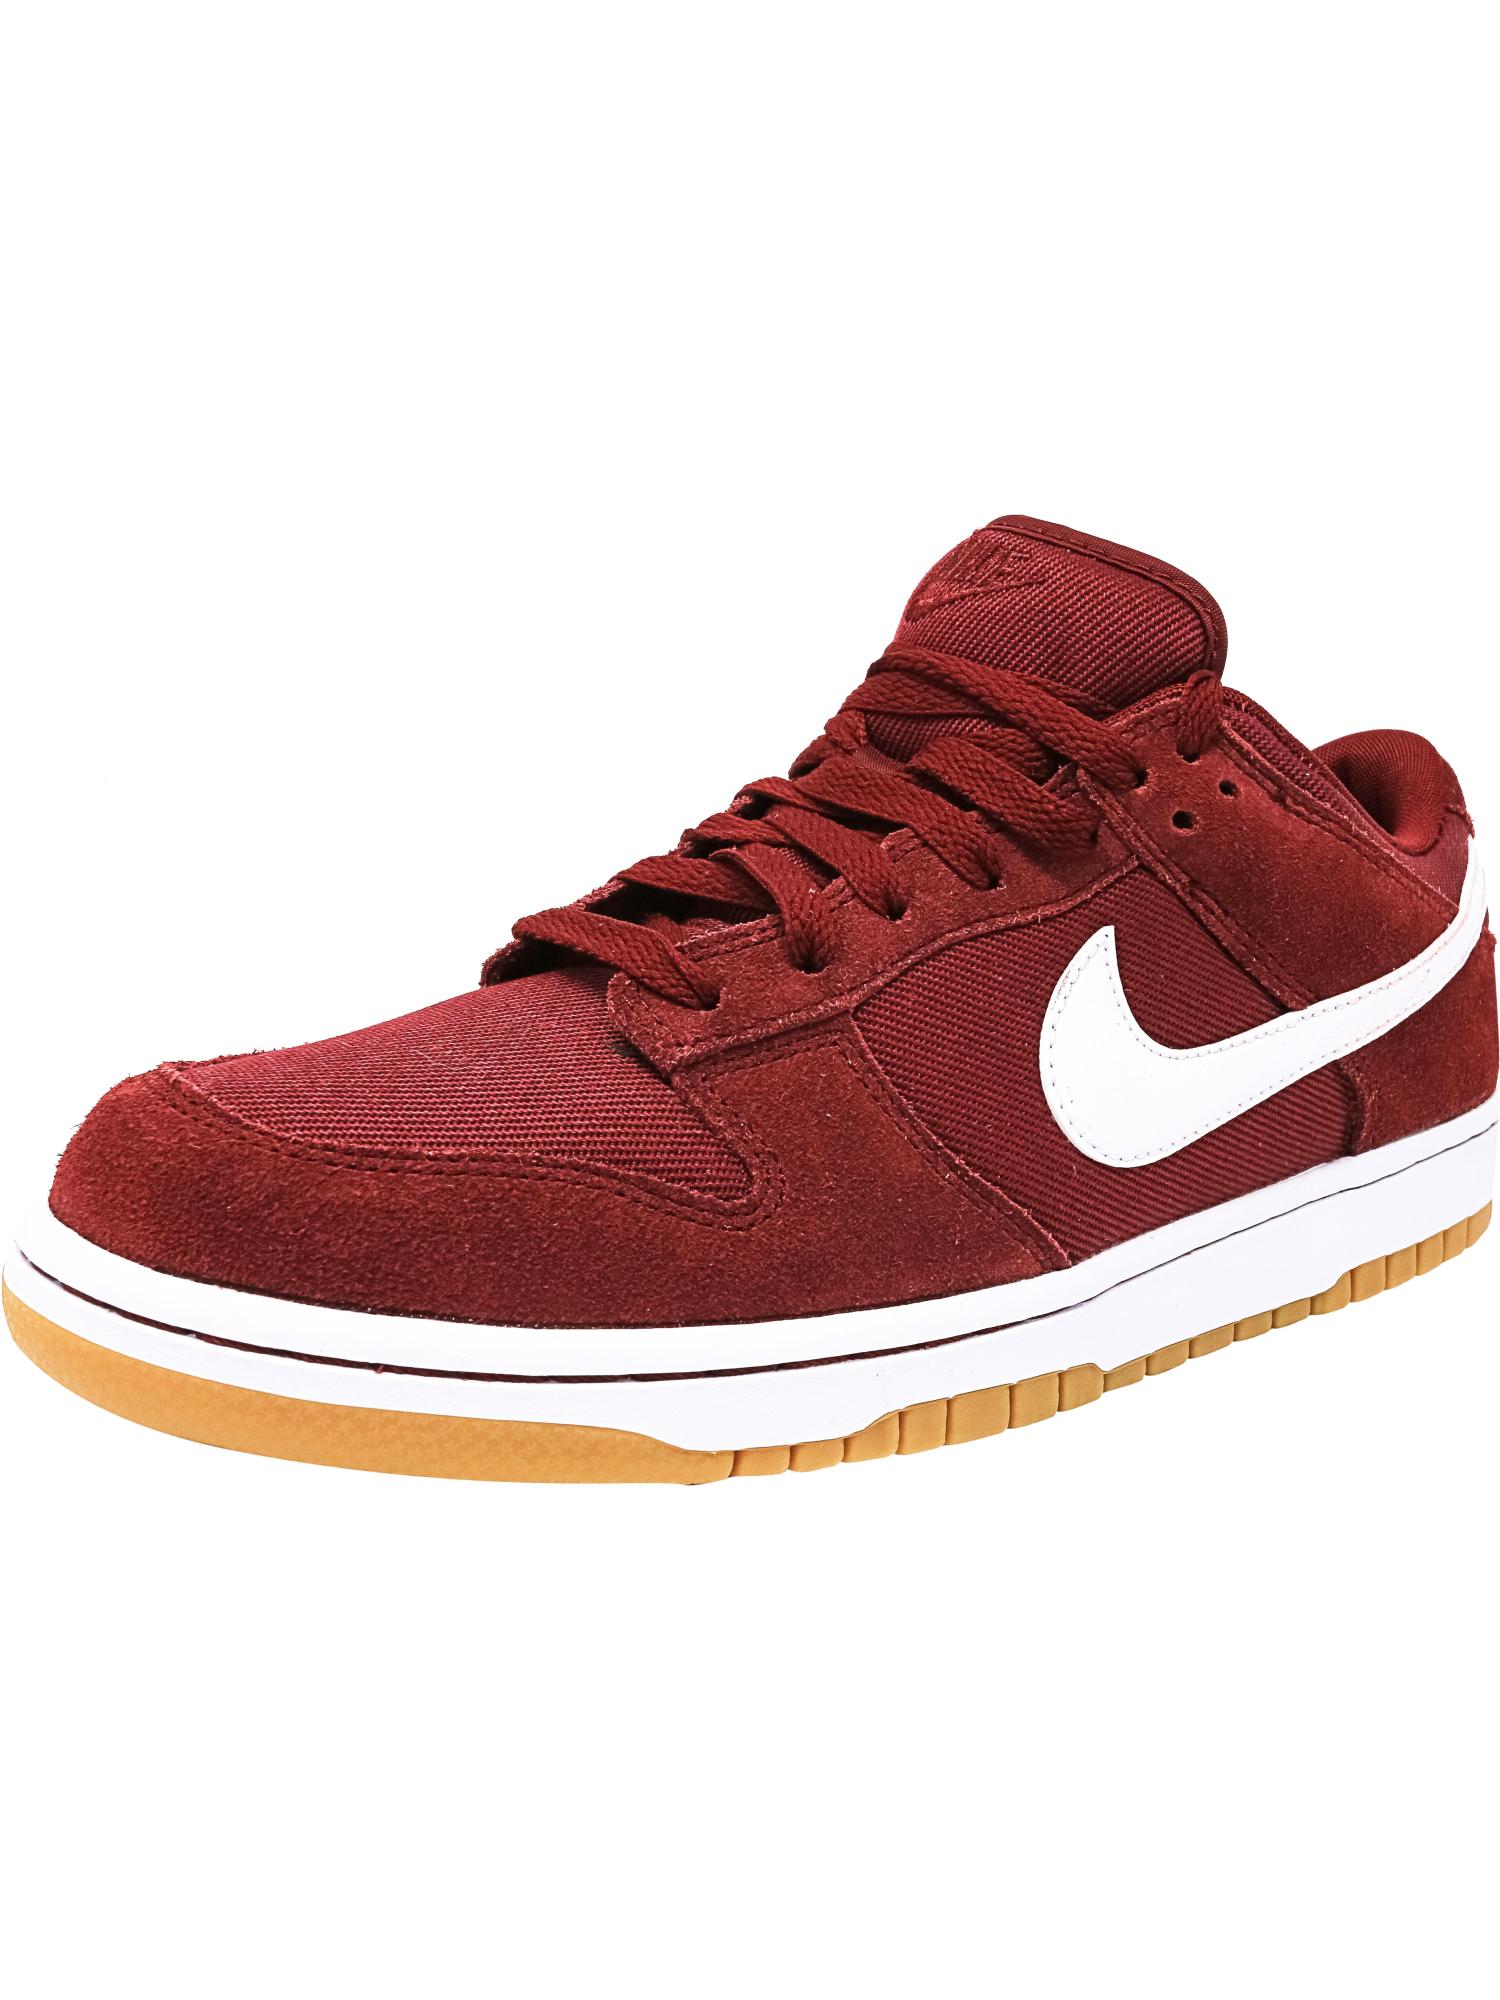 sports shoes 496f7 e1e93 ... Nike Men s Dunk Low Ankle-High Suede Fashion Sneaker Sneaker Sneaker  12835e